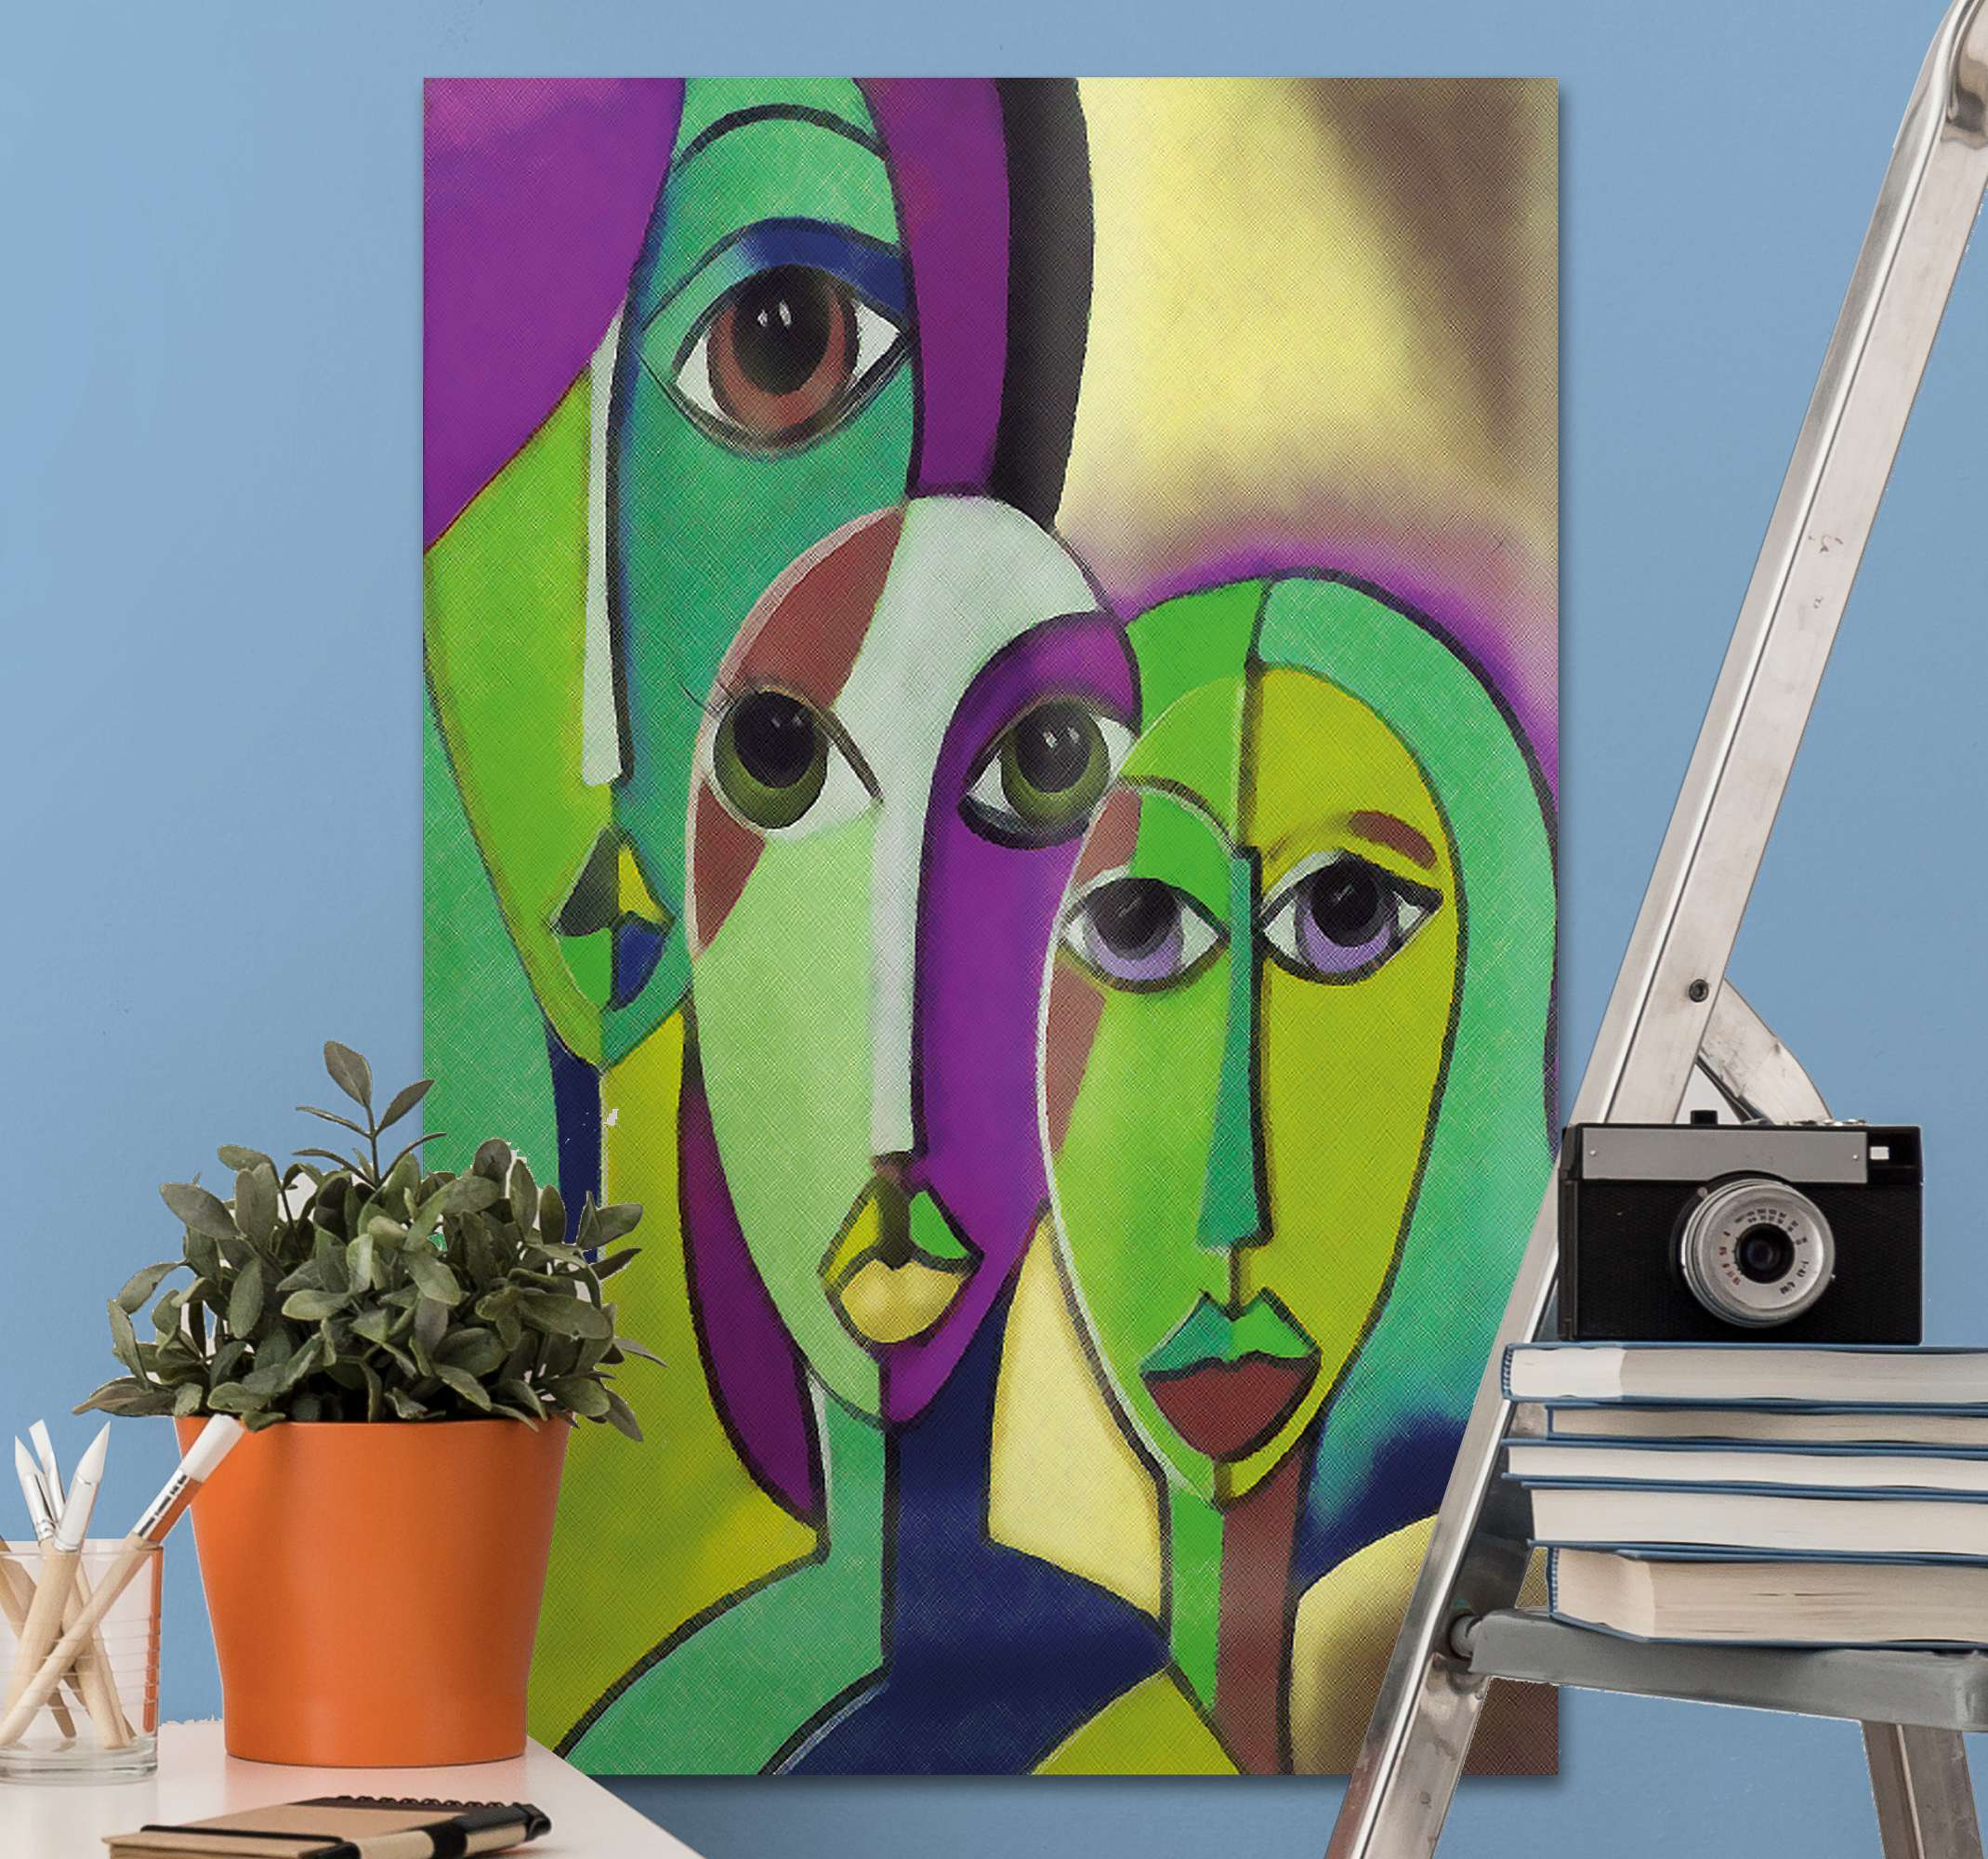 TenStickers. 人们全家福人物和人物帆布版画. 适用于家庭装饰,办公室,商业,轿车,水疗中心,客房等的人物和角色画布艺术印花。它经久耐用且抗褪色。